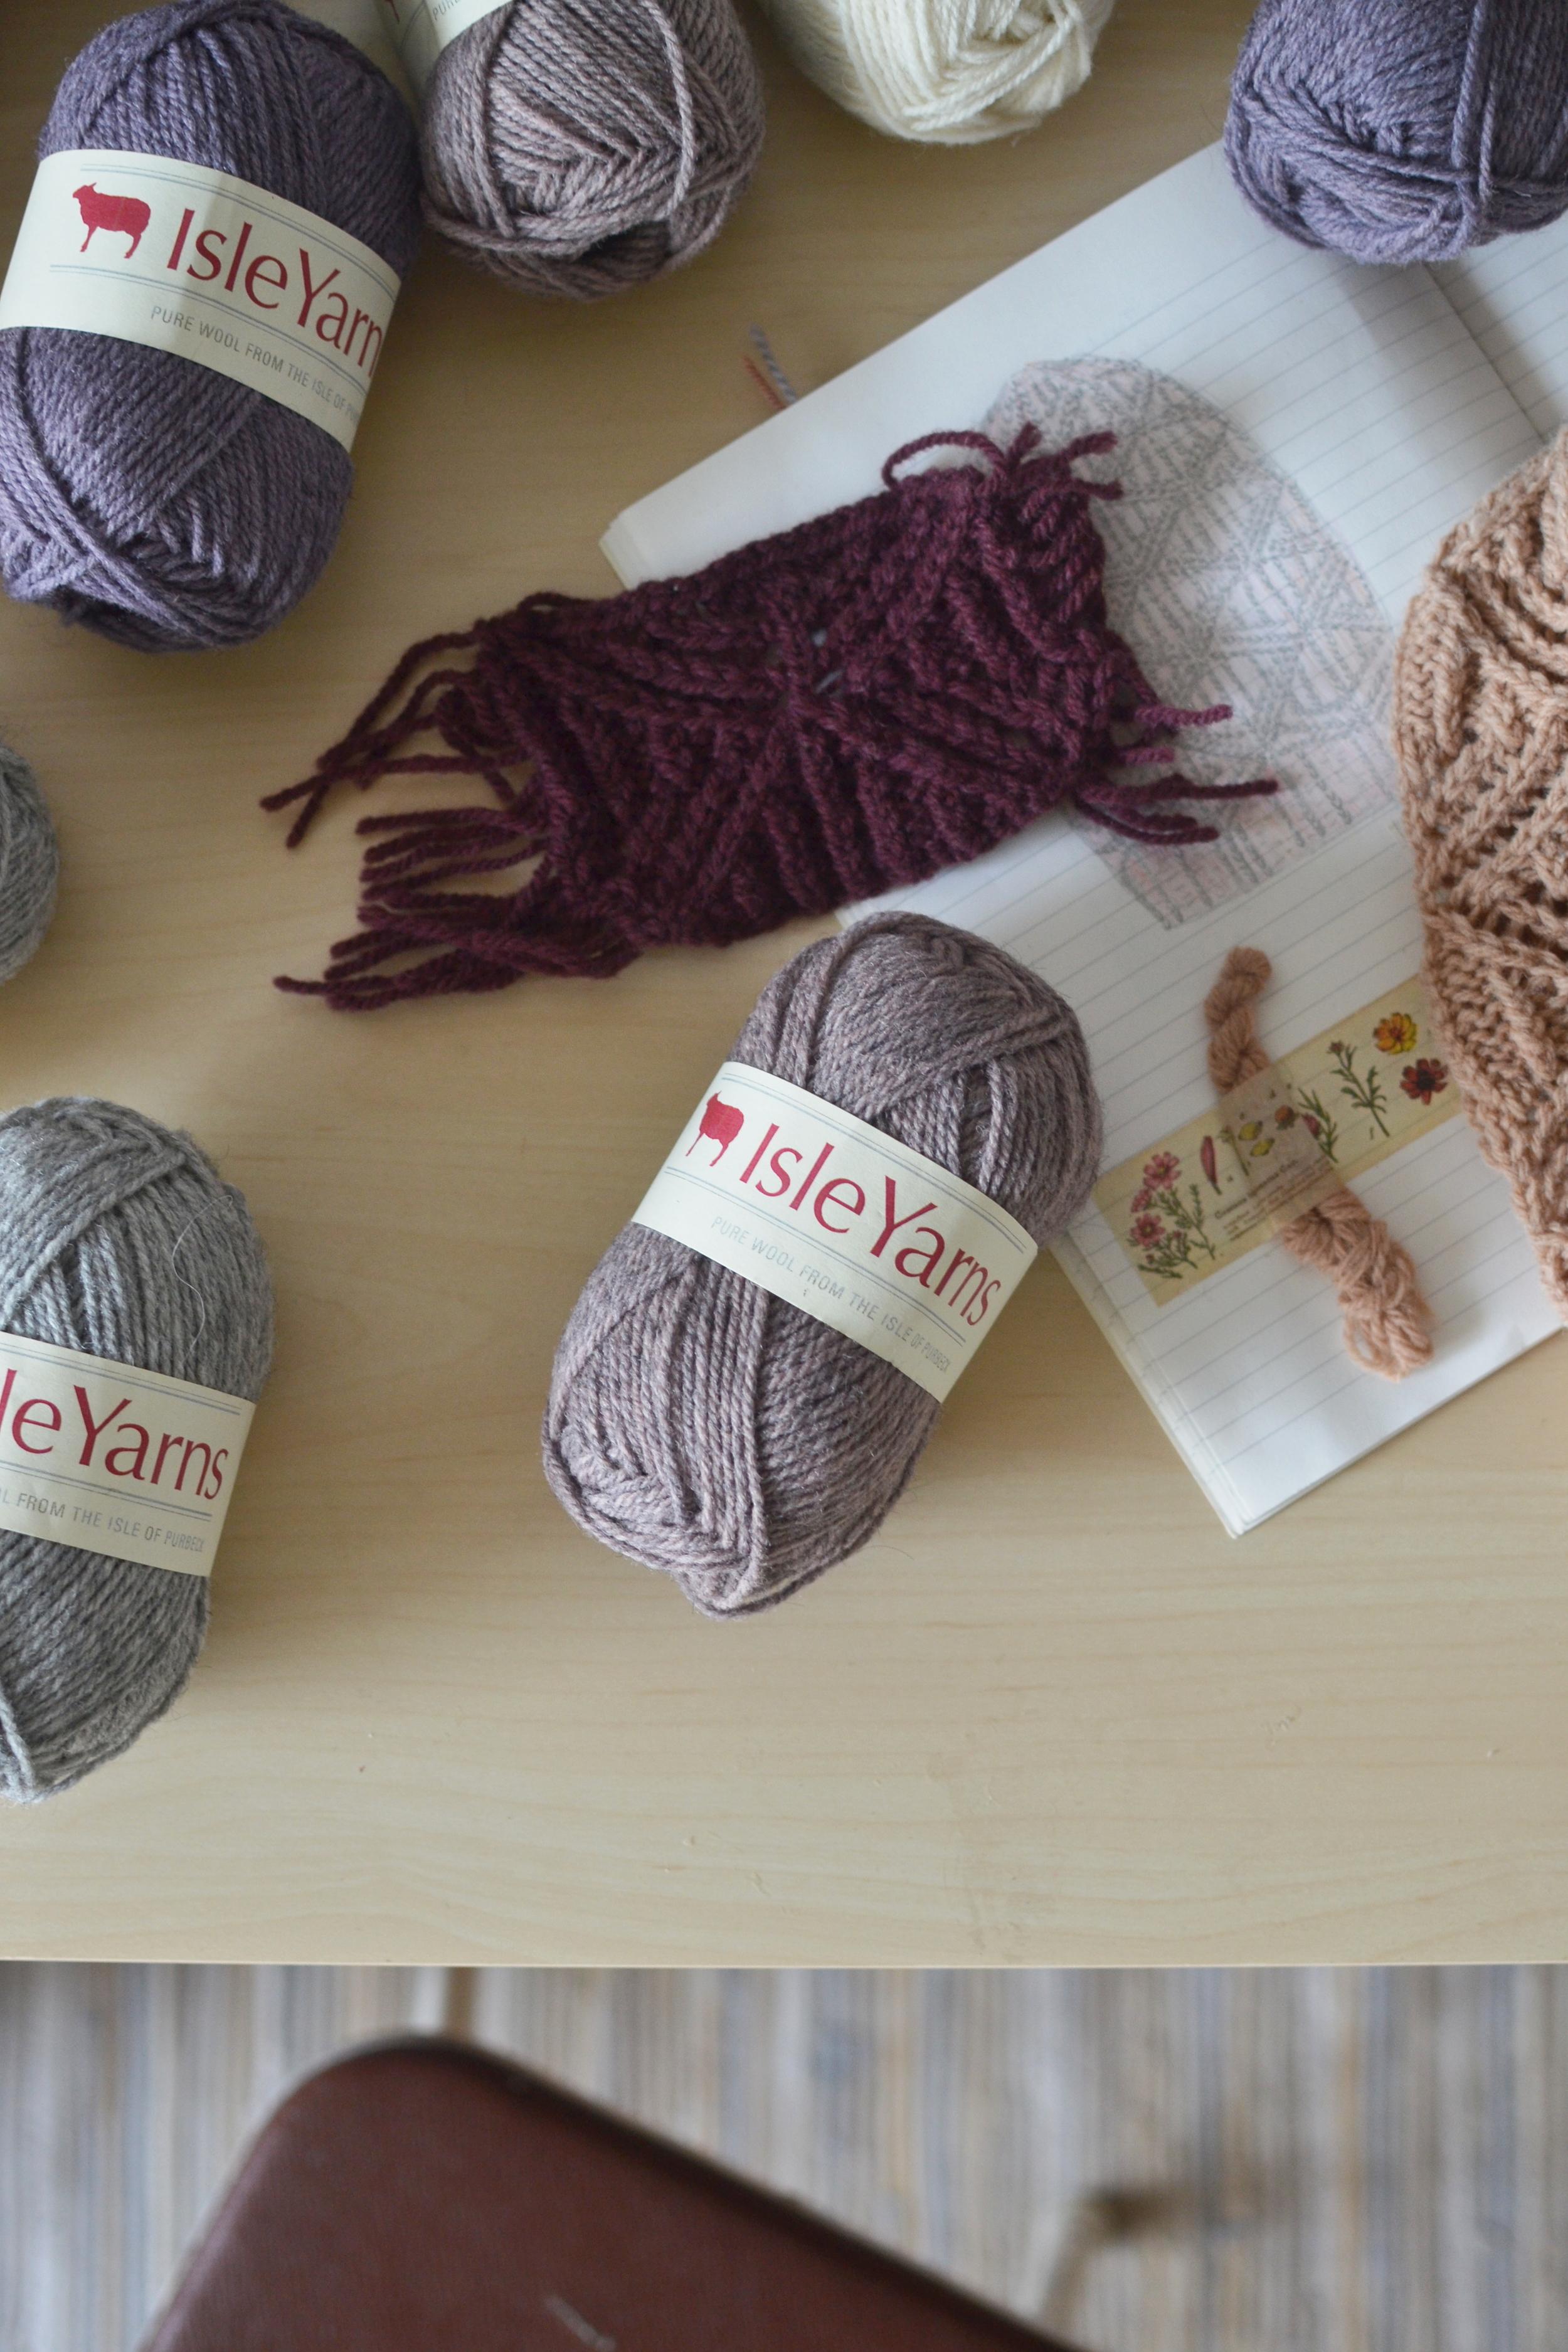 Mandarine's yarn review & giveaway: Isle yarns